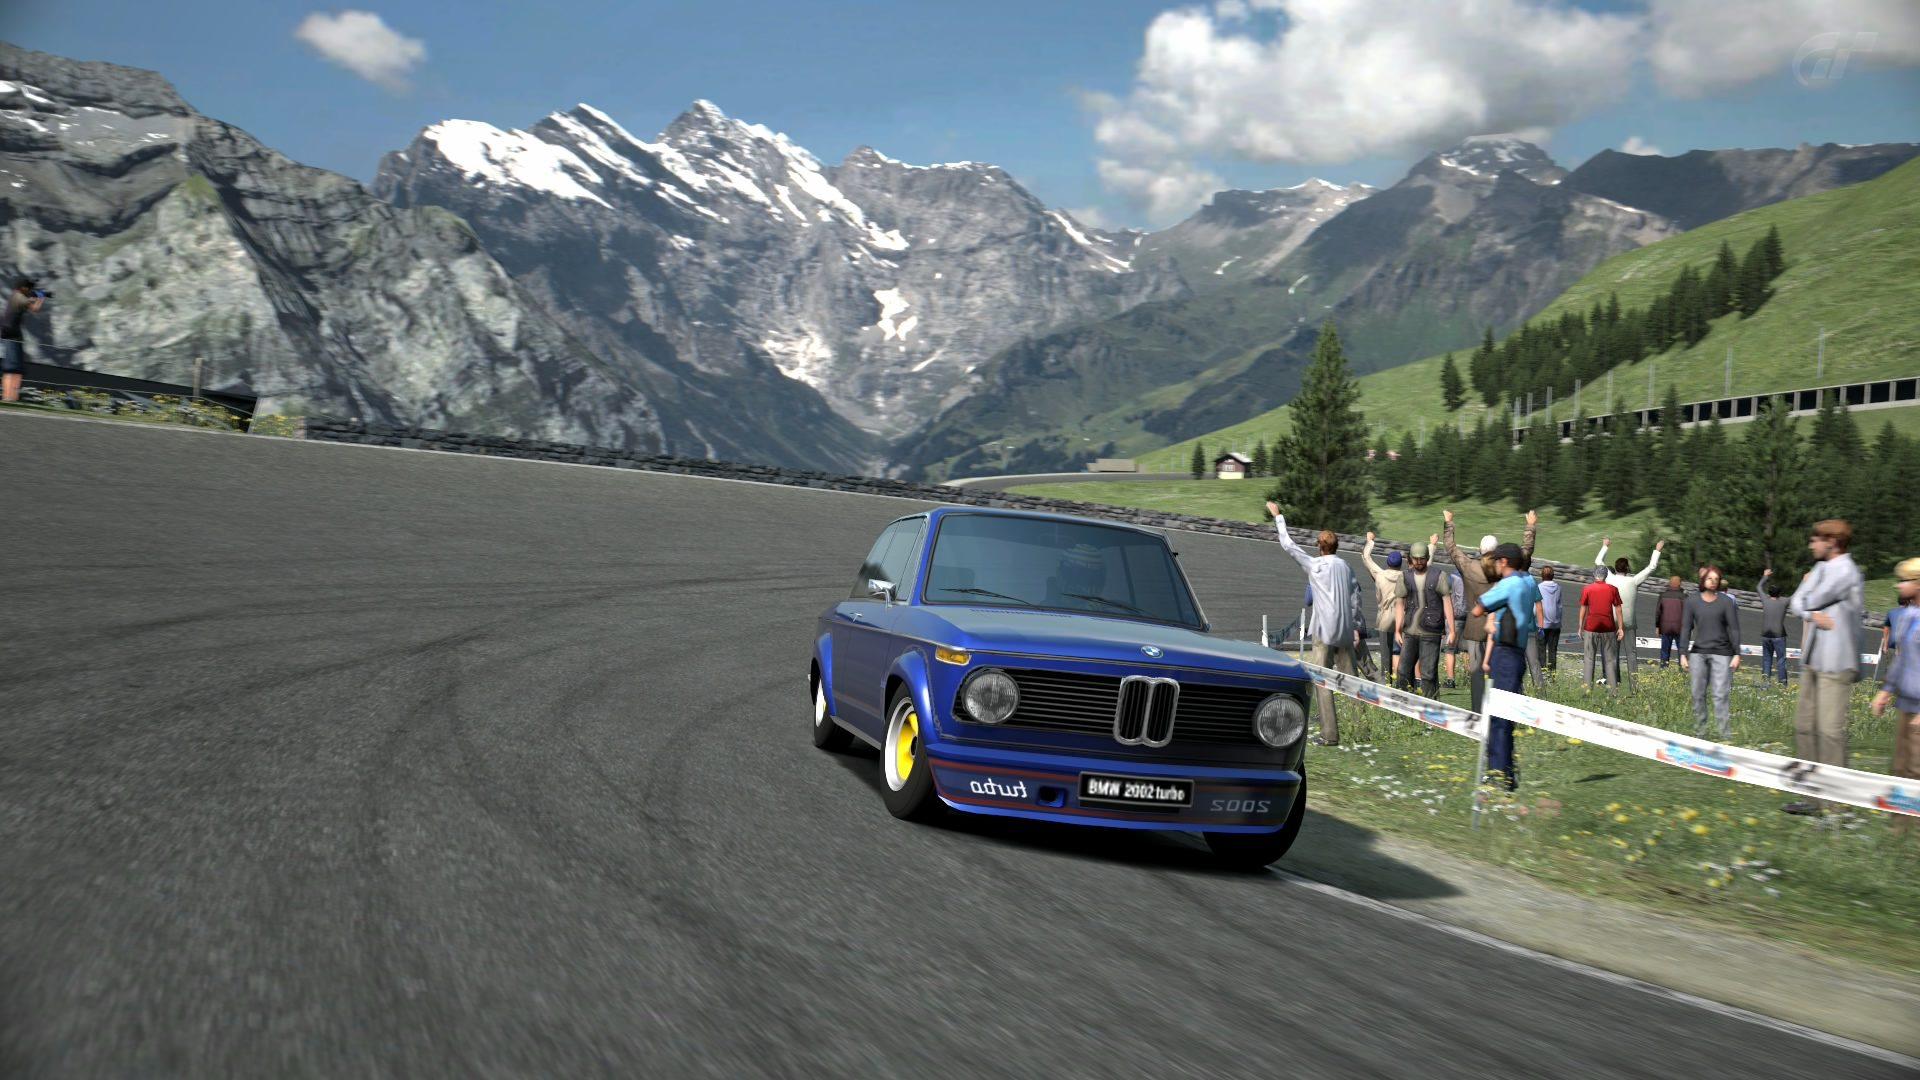 Eiger Nordwand - Short Track_2.jpg